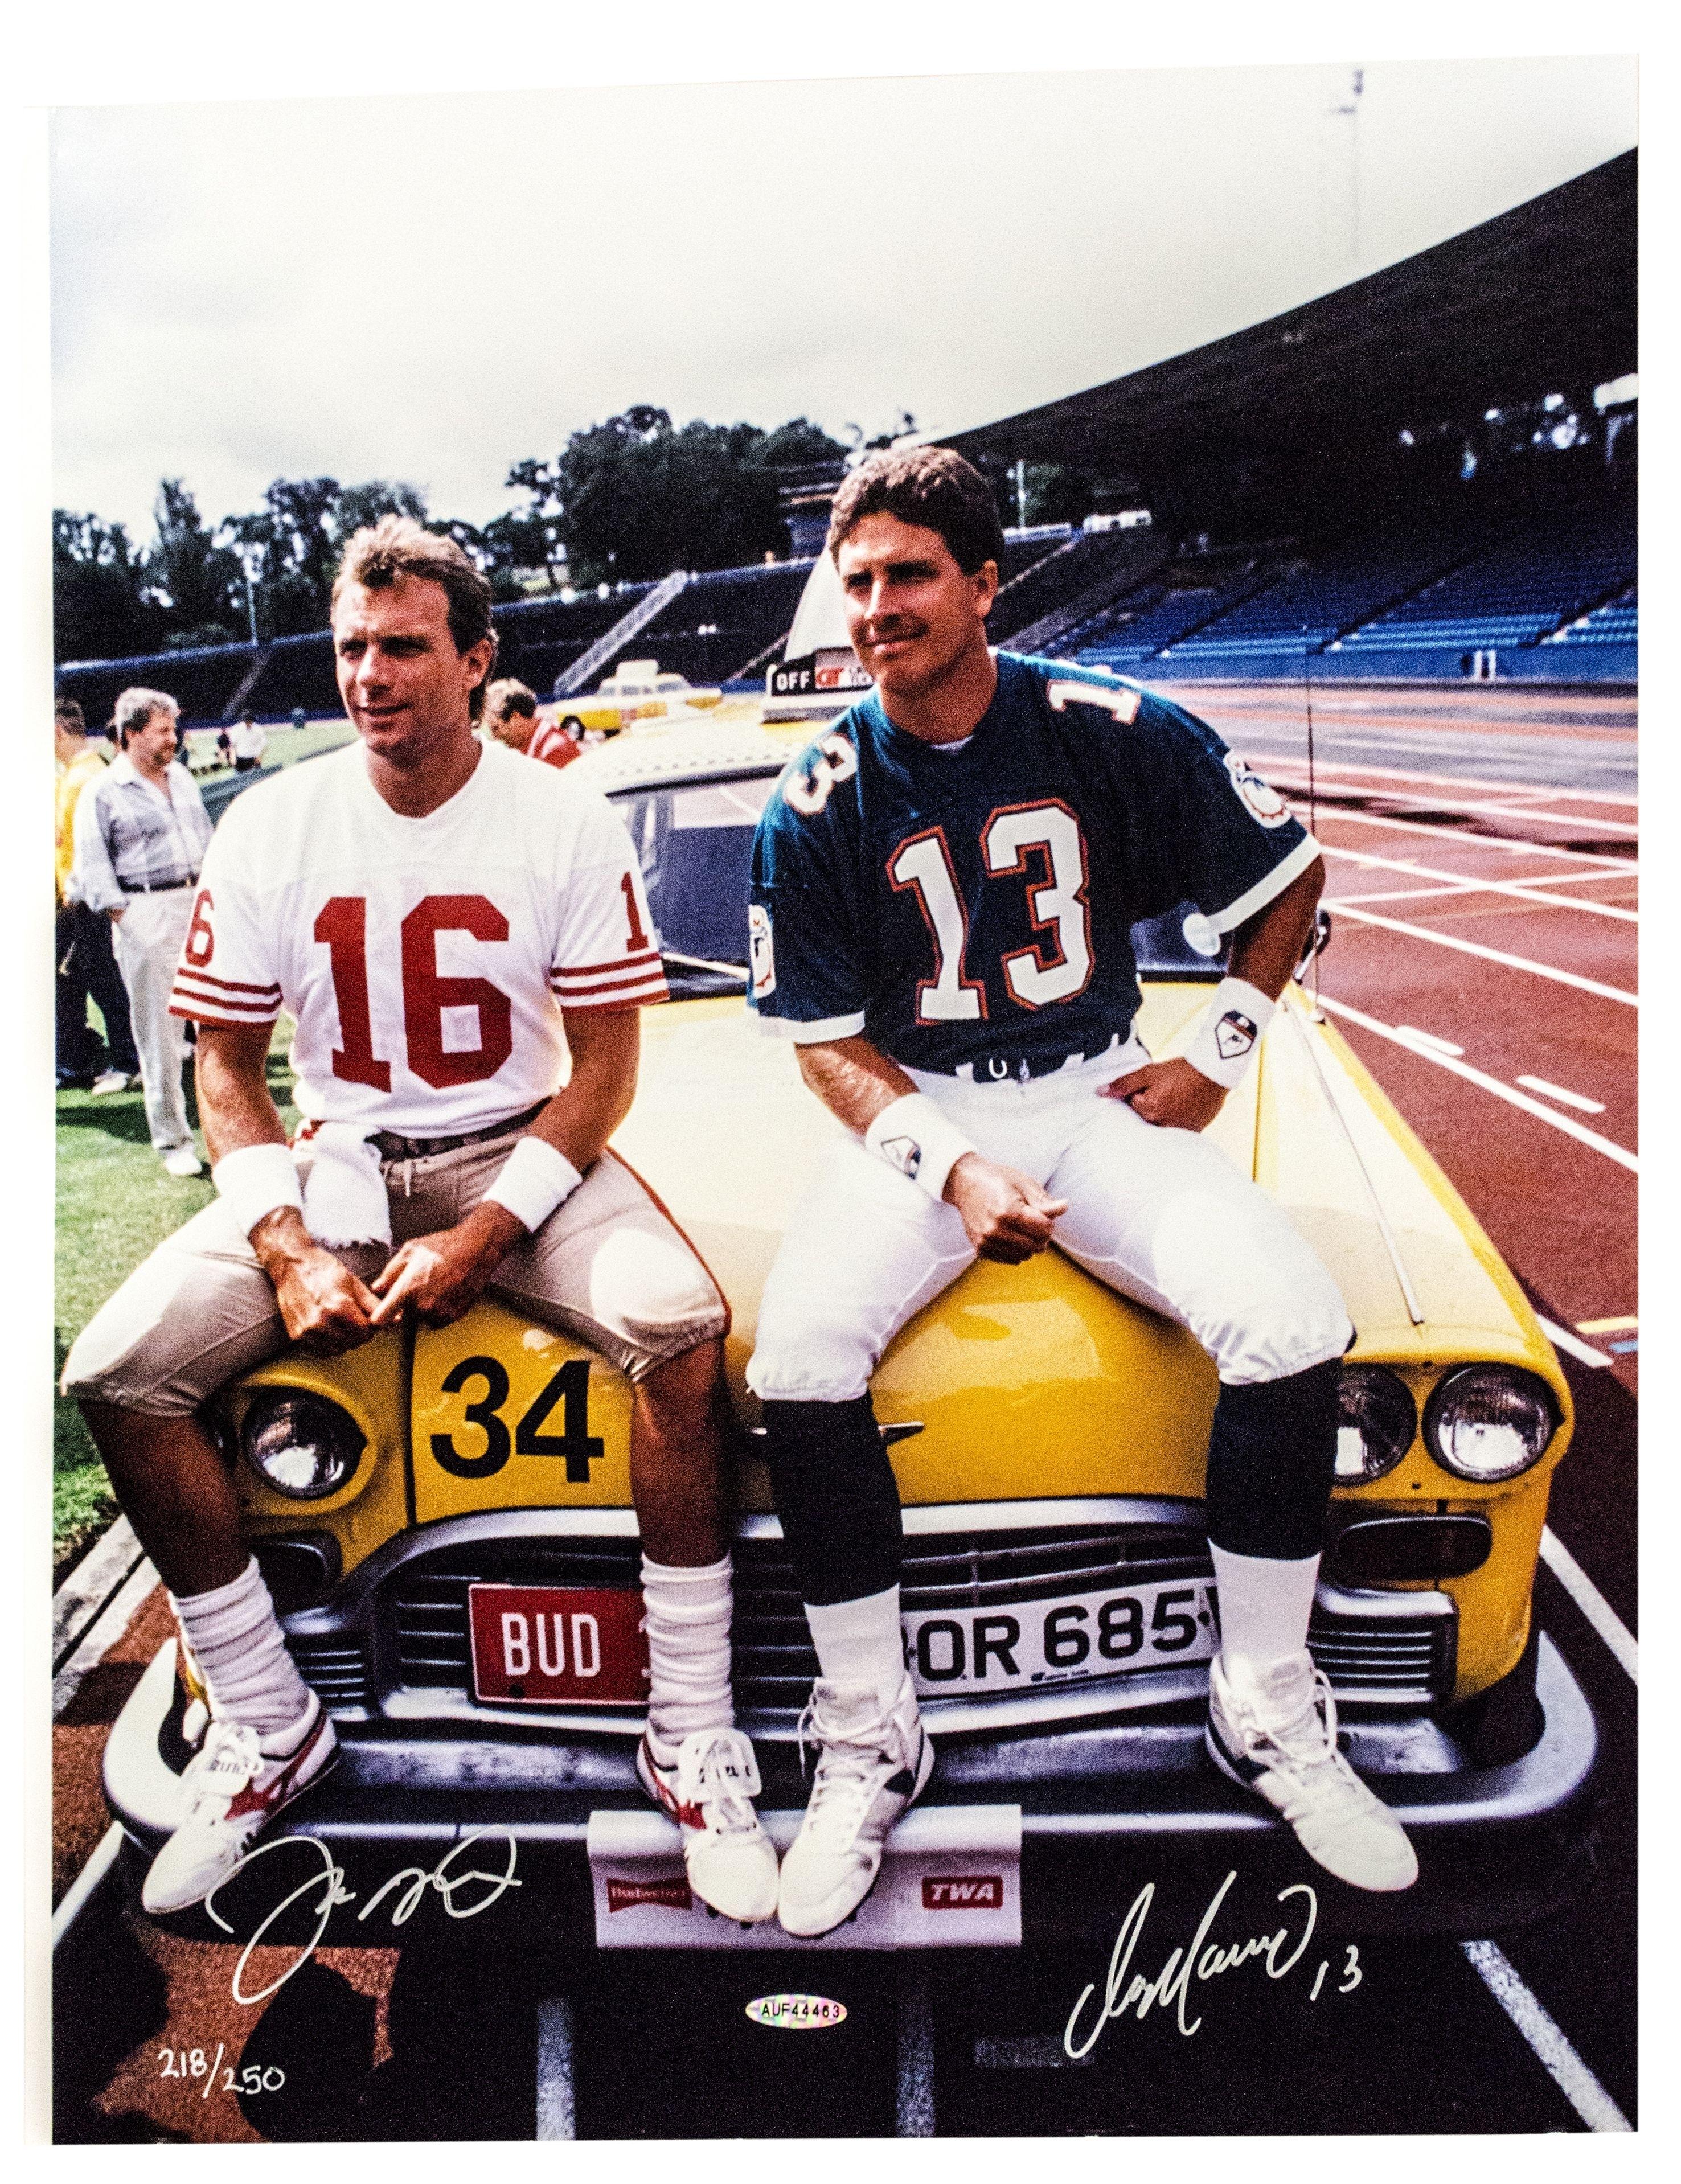 Joe Montana And Dan Marino Super Bowl Xix 1985 : Oldschoolcool pertaining to Dan Marino Super Bowl